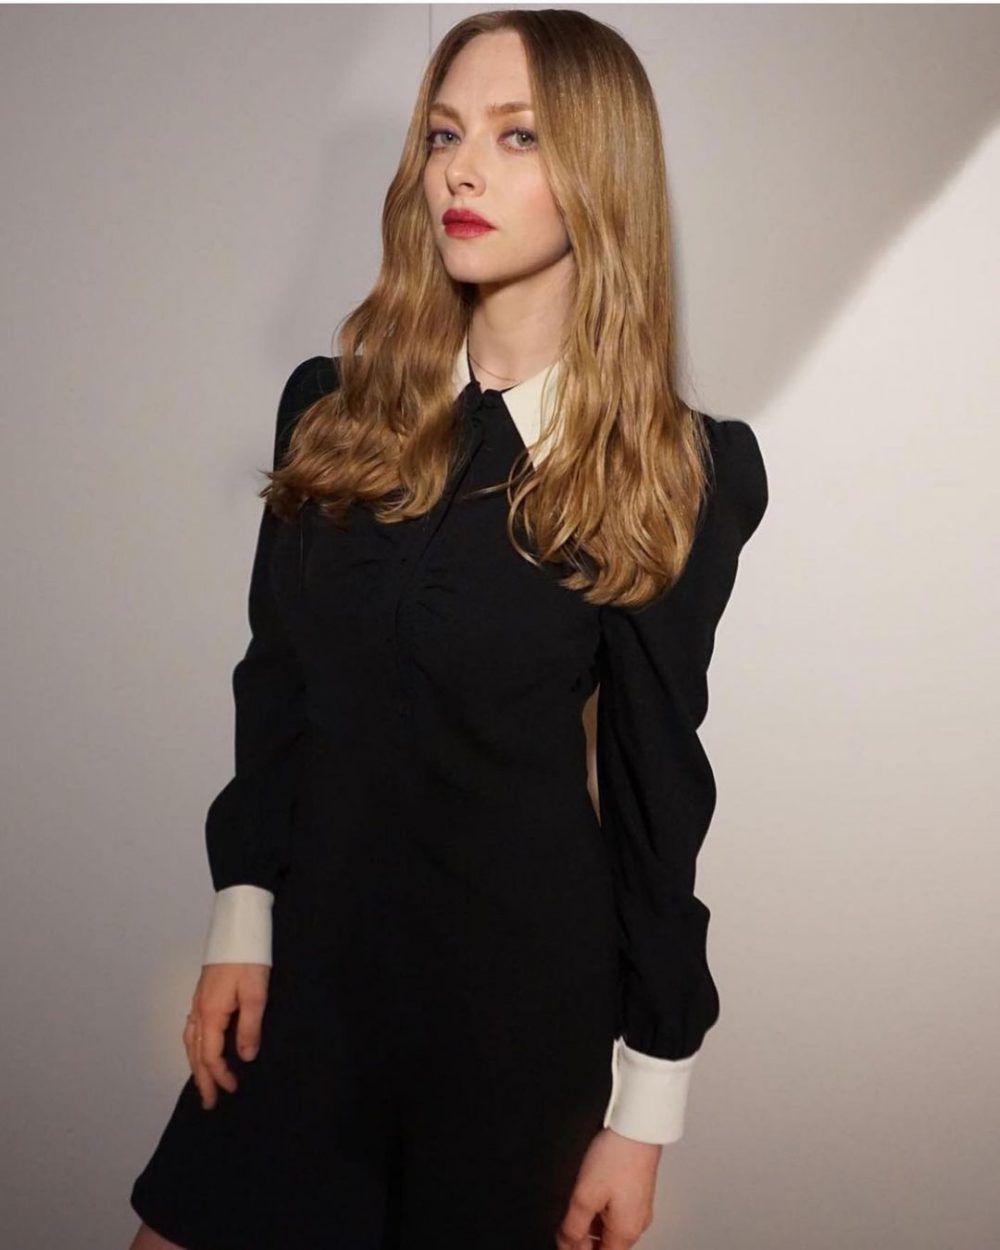 Amanda Seyfried Black And White Spring 2015 Collection Shirt Dress Saint Laurent In 2021 Celebrity Street Style Star Fashion Amanda Seyfried [ 1250 x 1000 Pixel ]